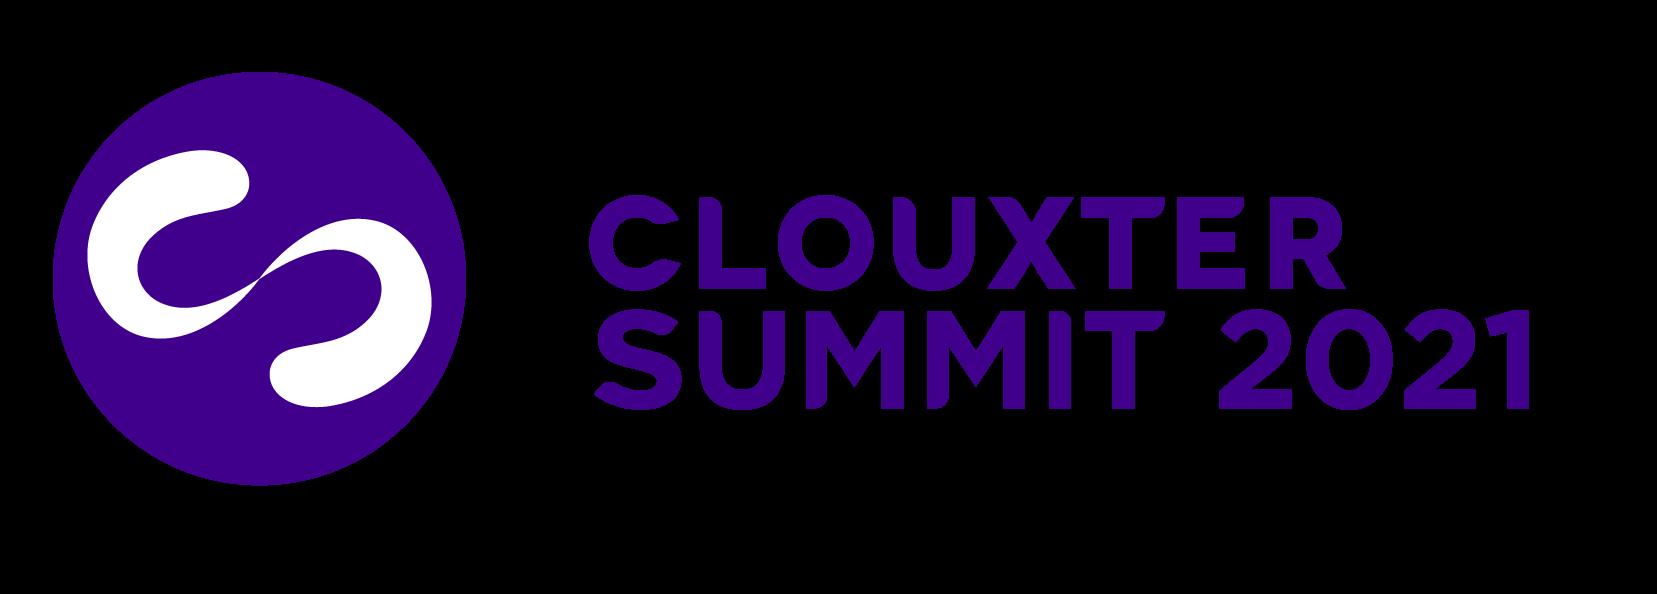 Clouxter Summit